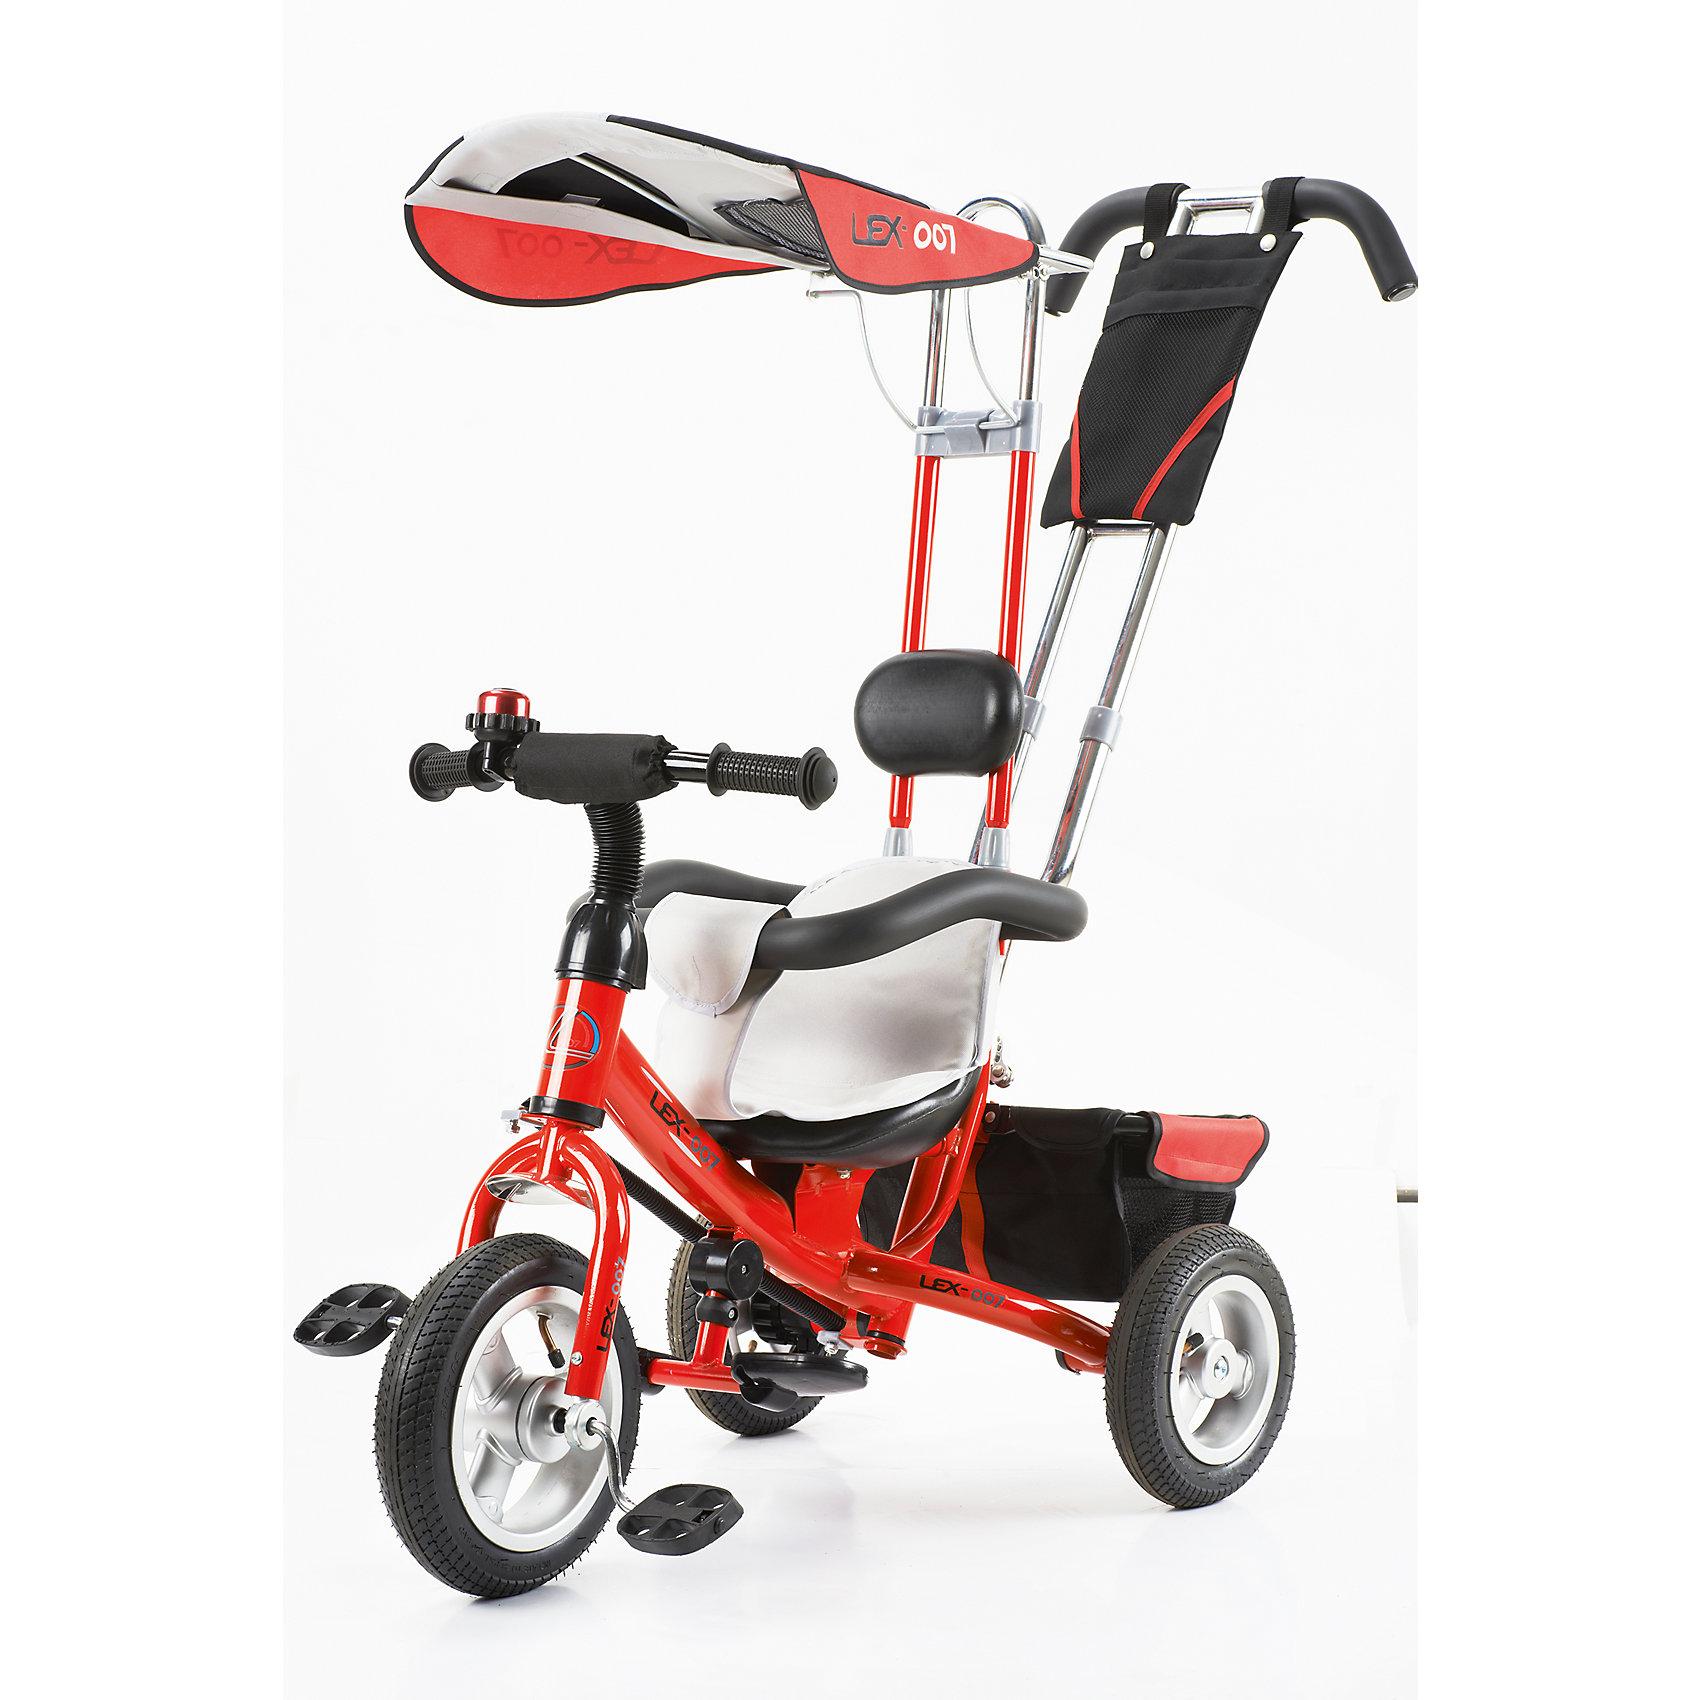 Трехколесный велосипед, VipLex, красный<br><br>Ширина мм: 550<br>Глубина мм: 400<br>Высота мм: 300<br>Вес г: 9000<br>Возраст от месяцев: 12<br>Возраст до месяцев: 48<br>Пол: Унисекс<br>Возраст: Детский<br>SKU: 4806682